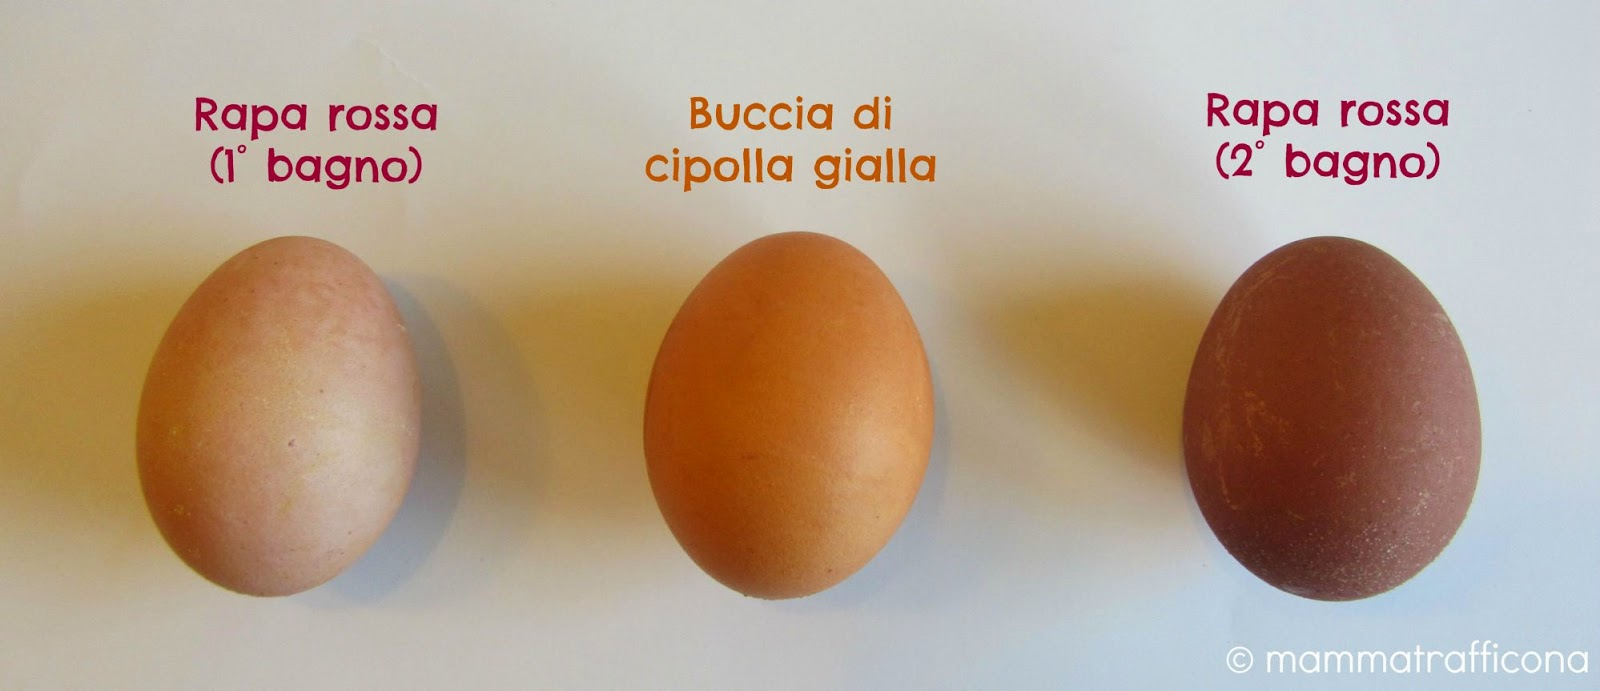 uova con tinture naturali vegetali